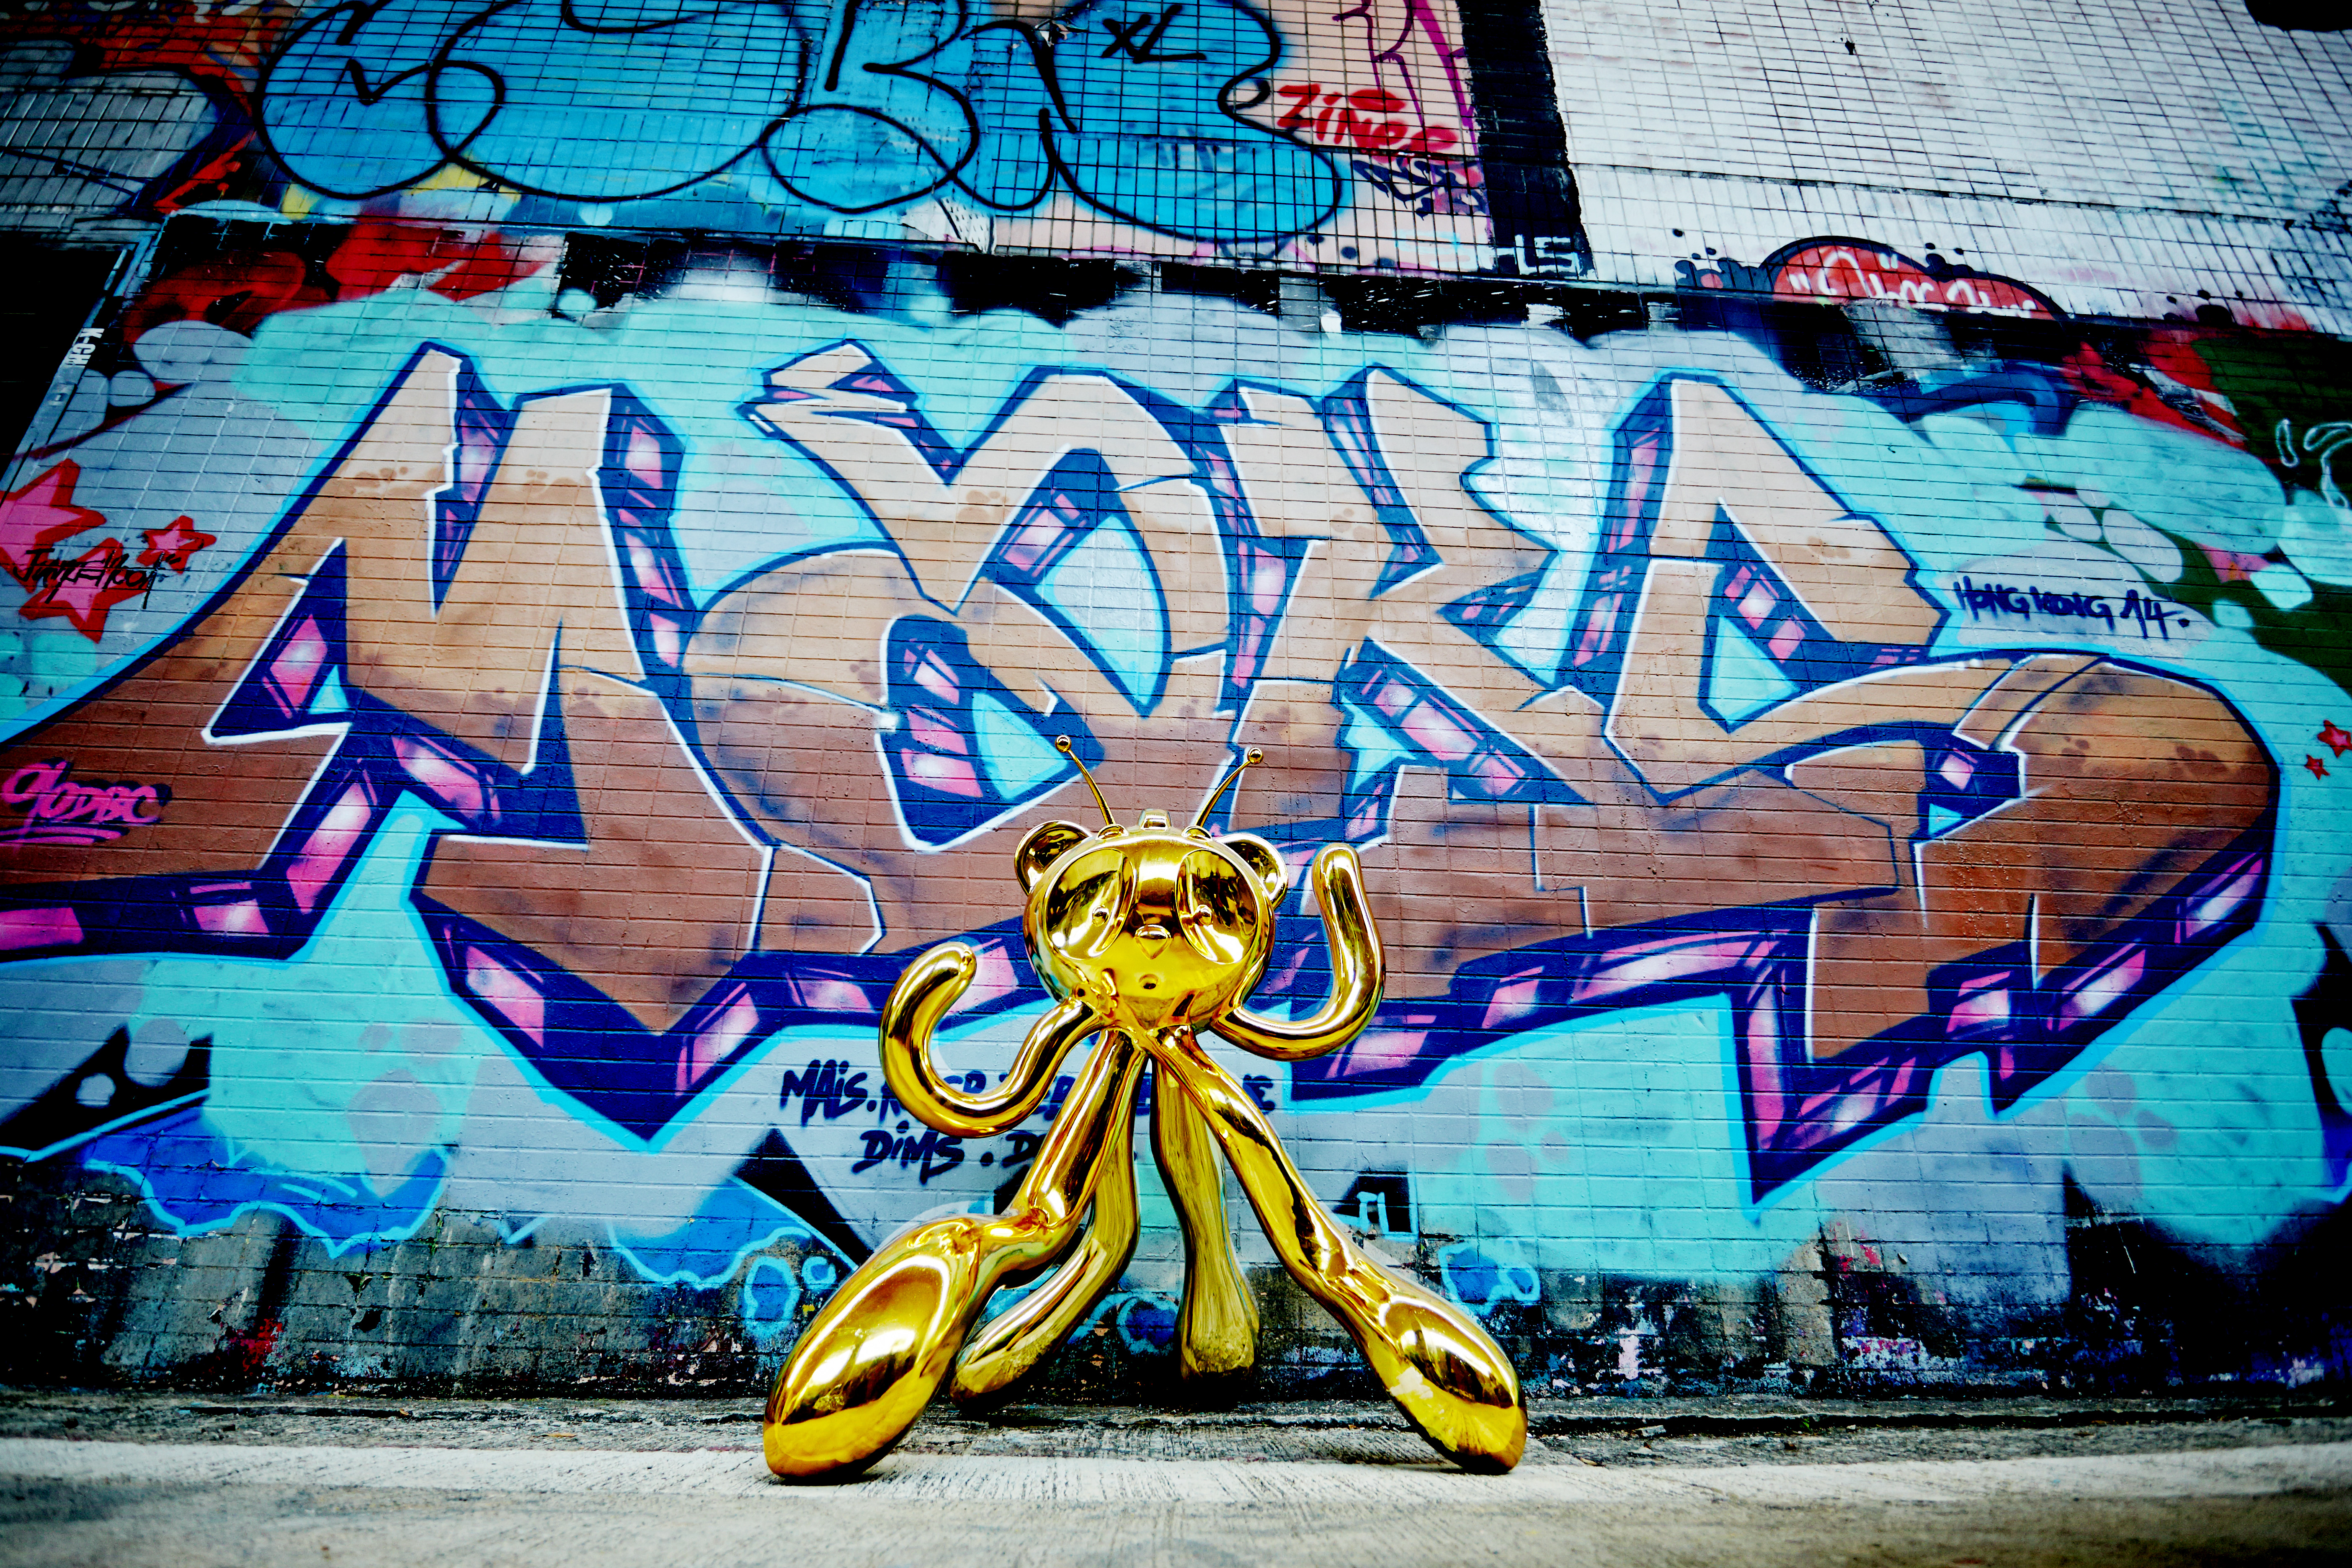 MK graffiti_111.jpg